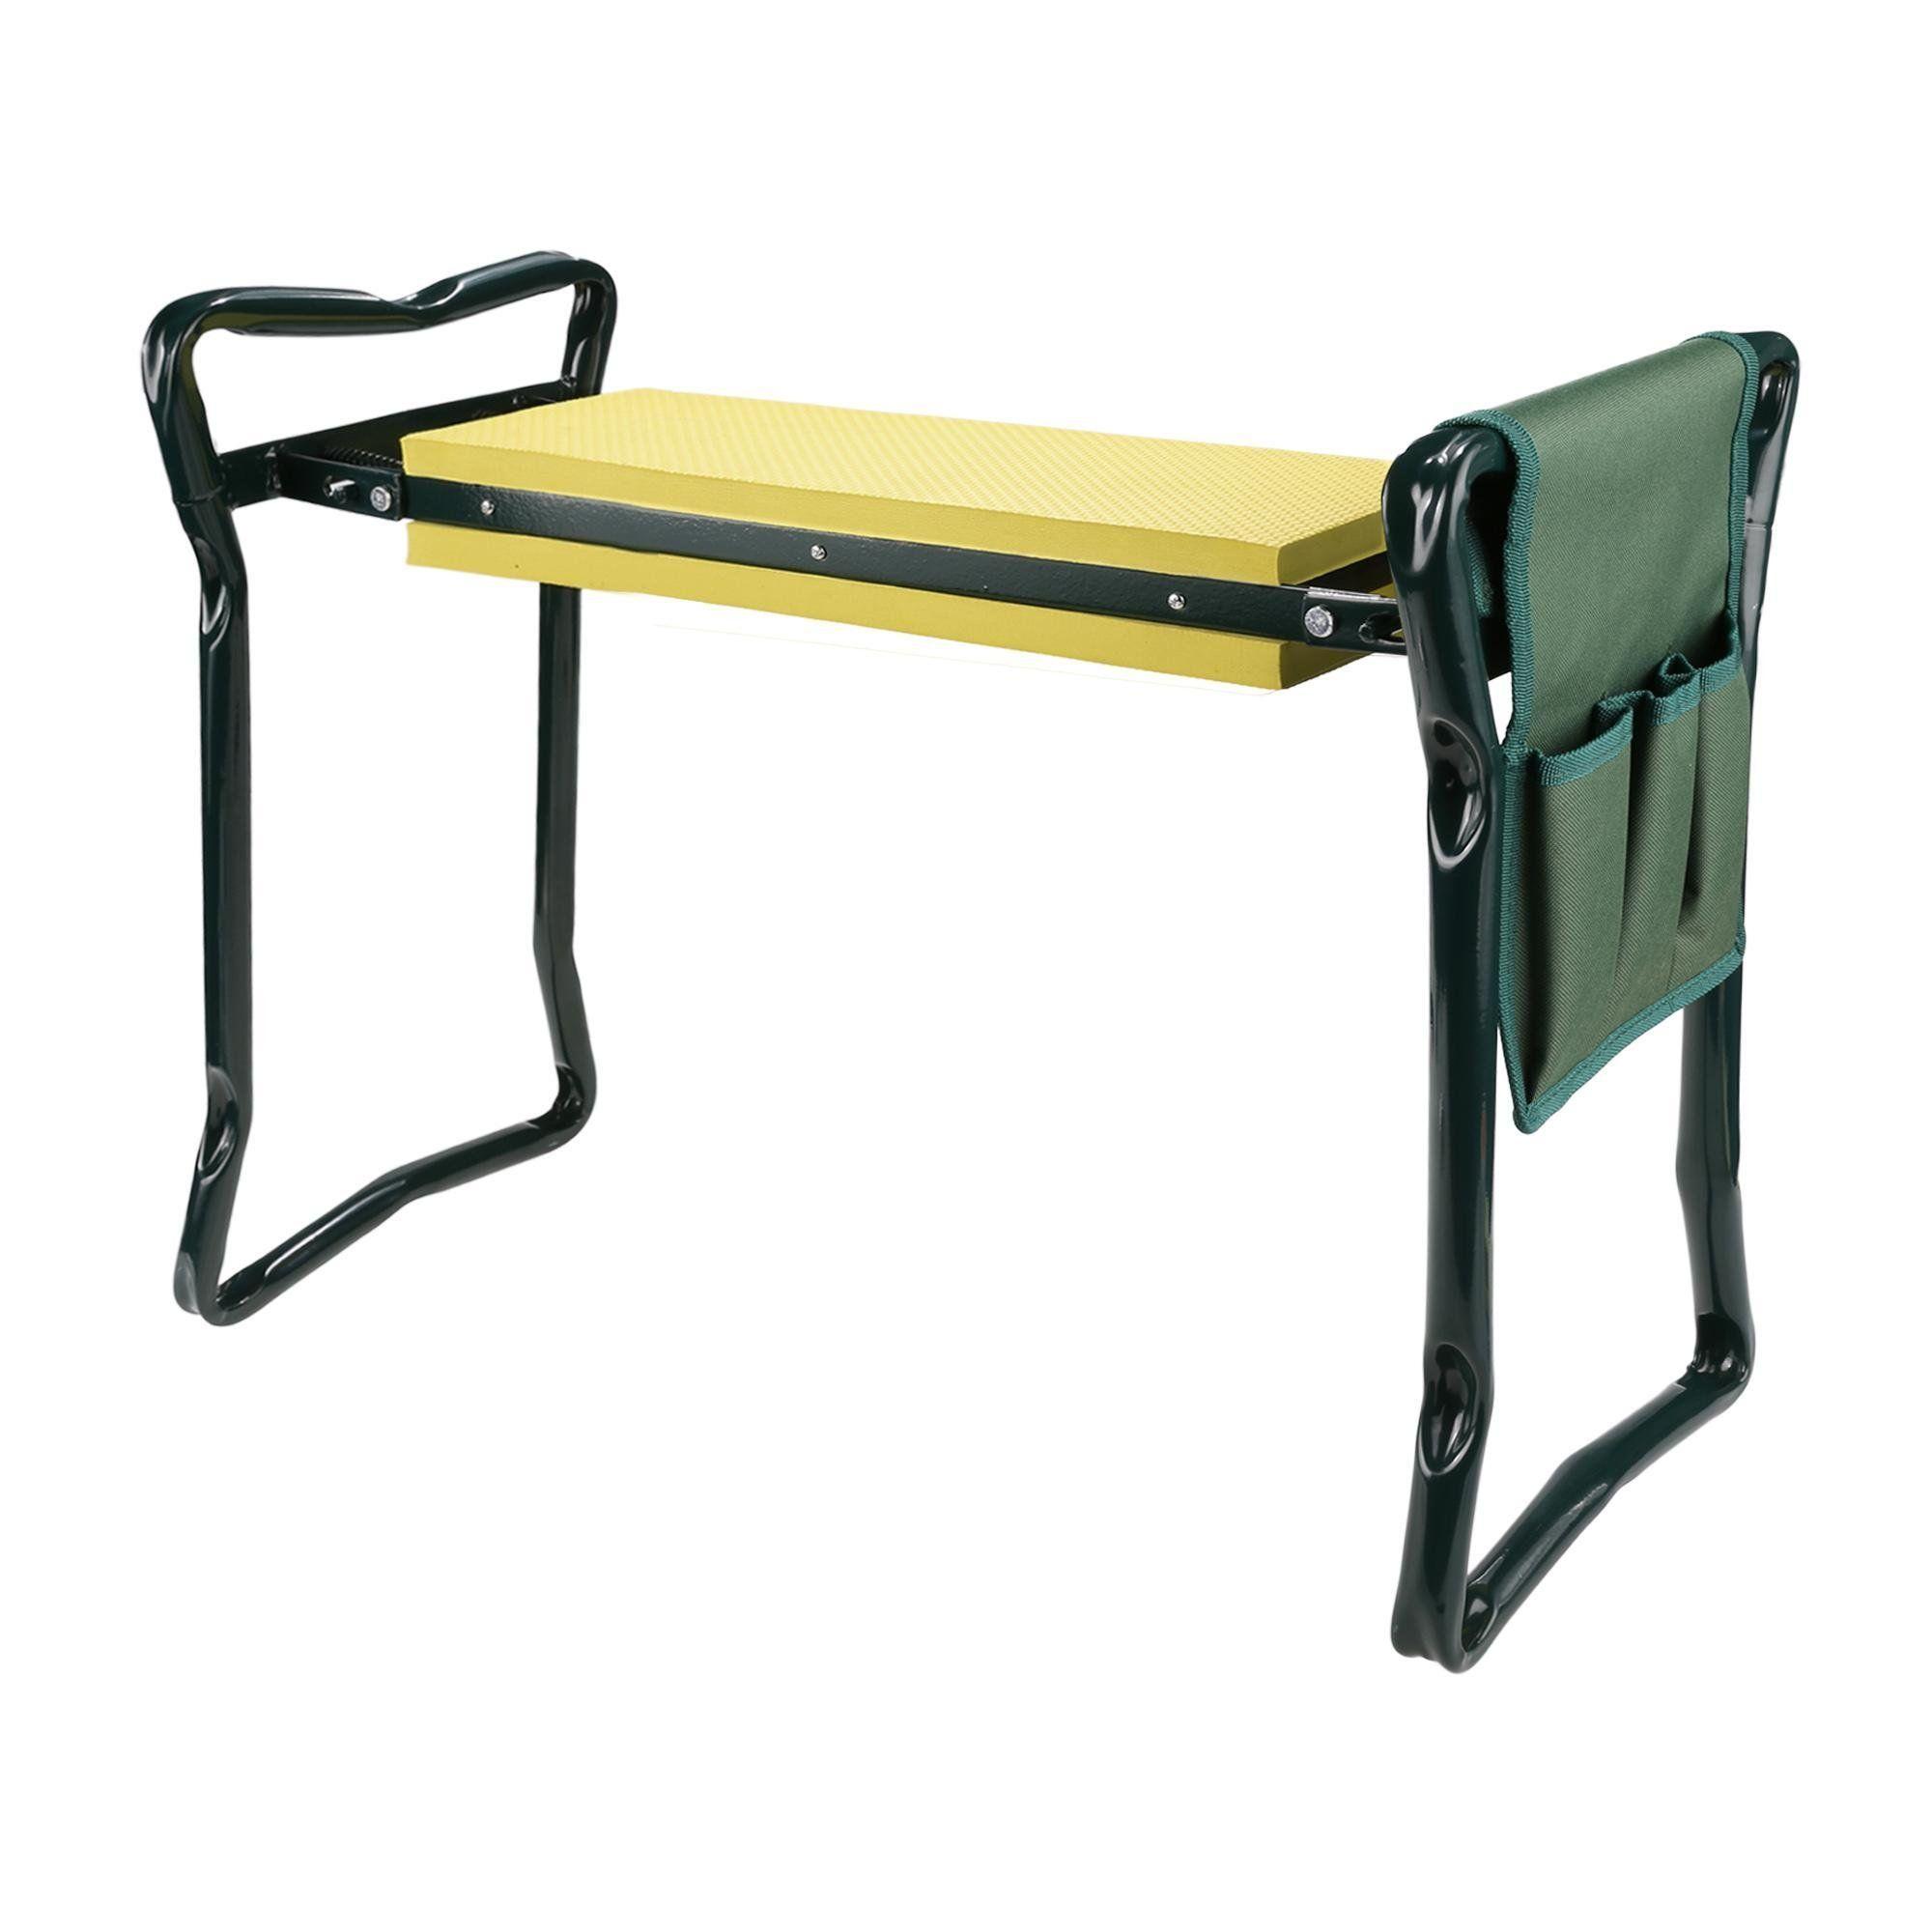 yellow Mewalker Foldable Garden Kneeler Seat with Bonus Tool Pouch Portable Stool EVA Foam Pad US STOCK